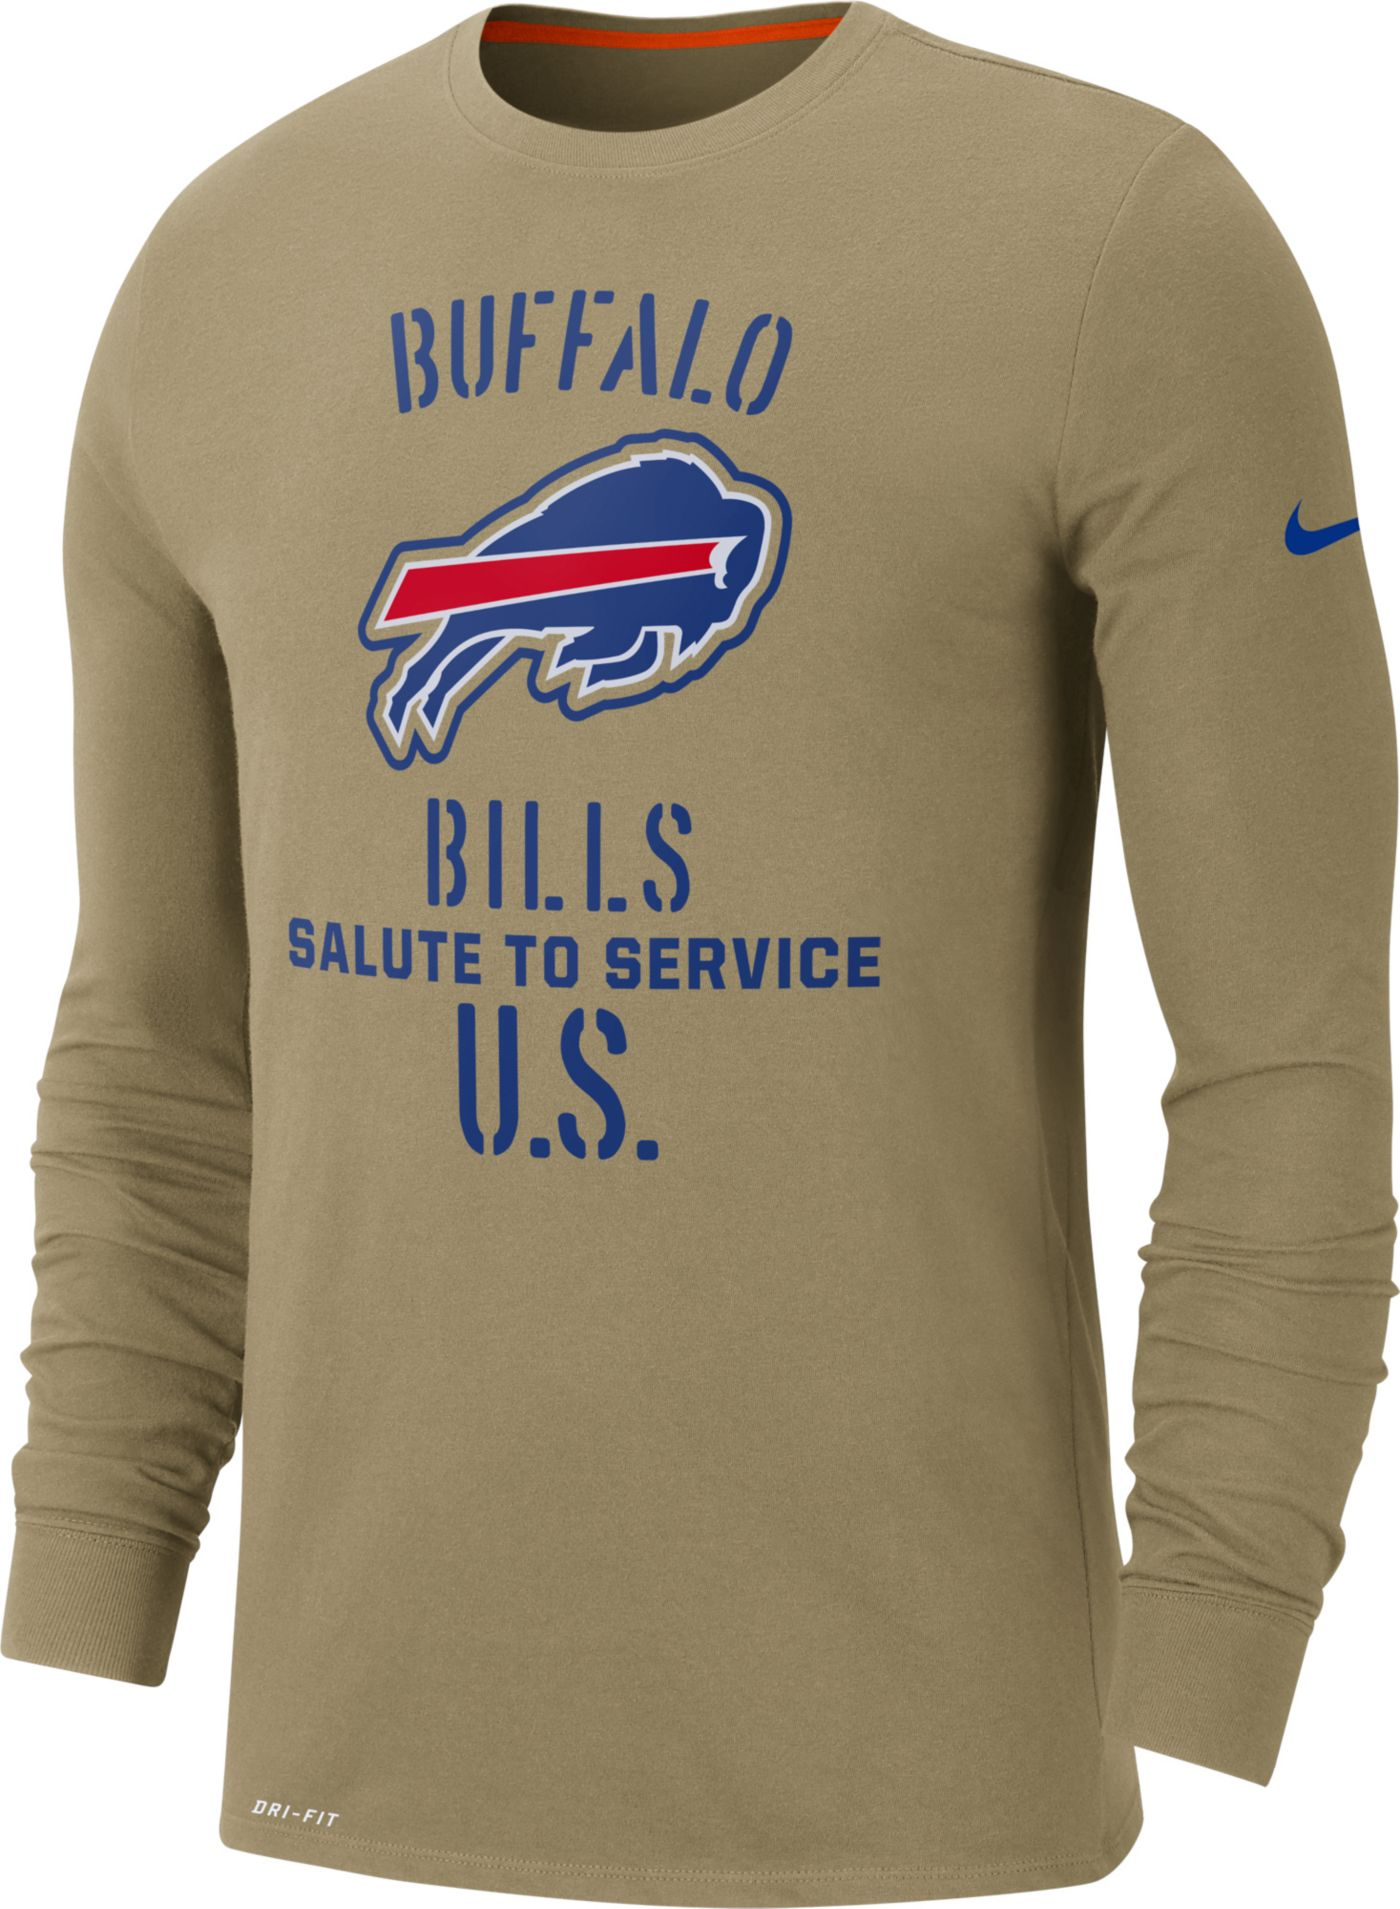 Nike Men's Salute to Service Buffalo Bills Dri-FIT Beige Long Sleeve Shirt